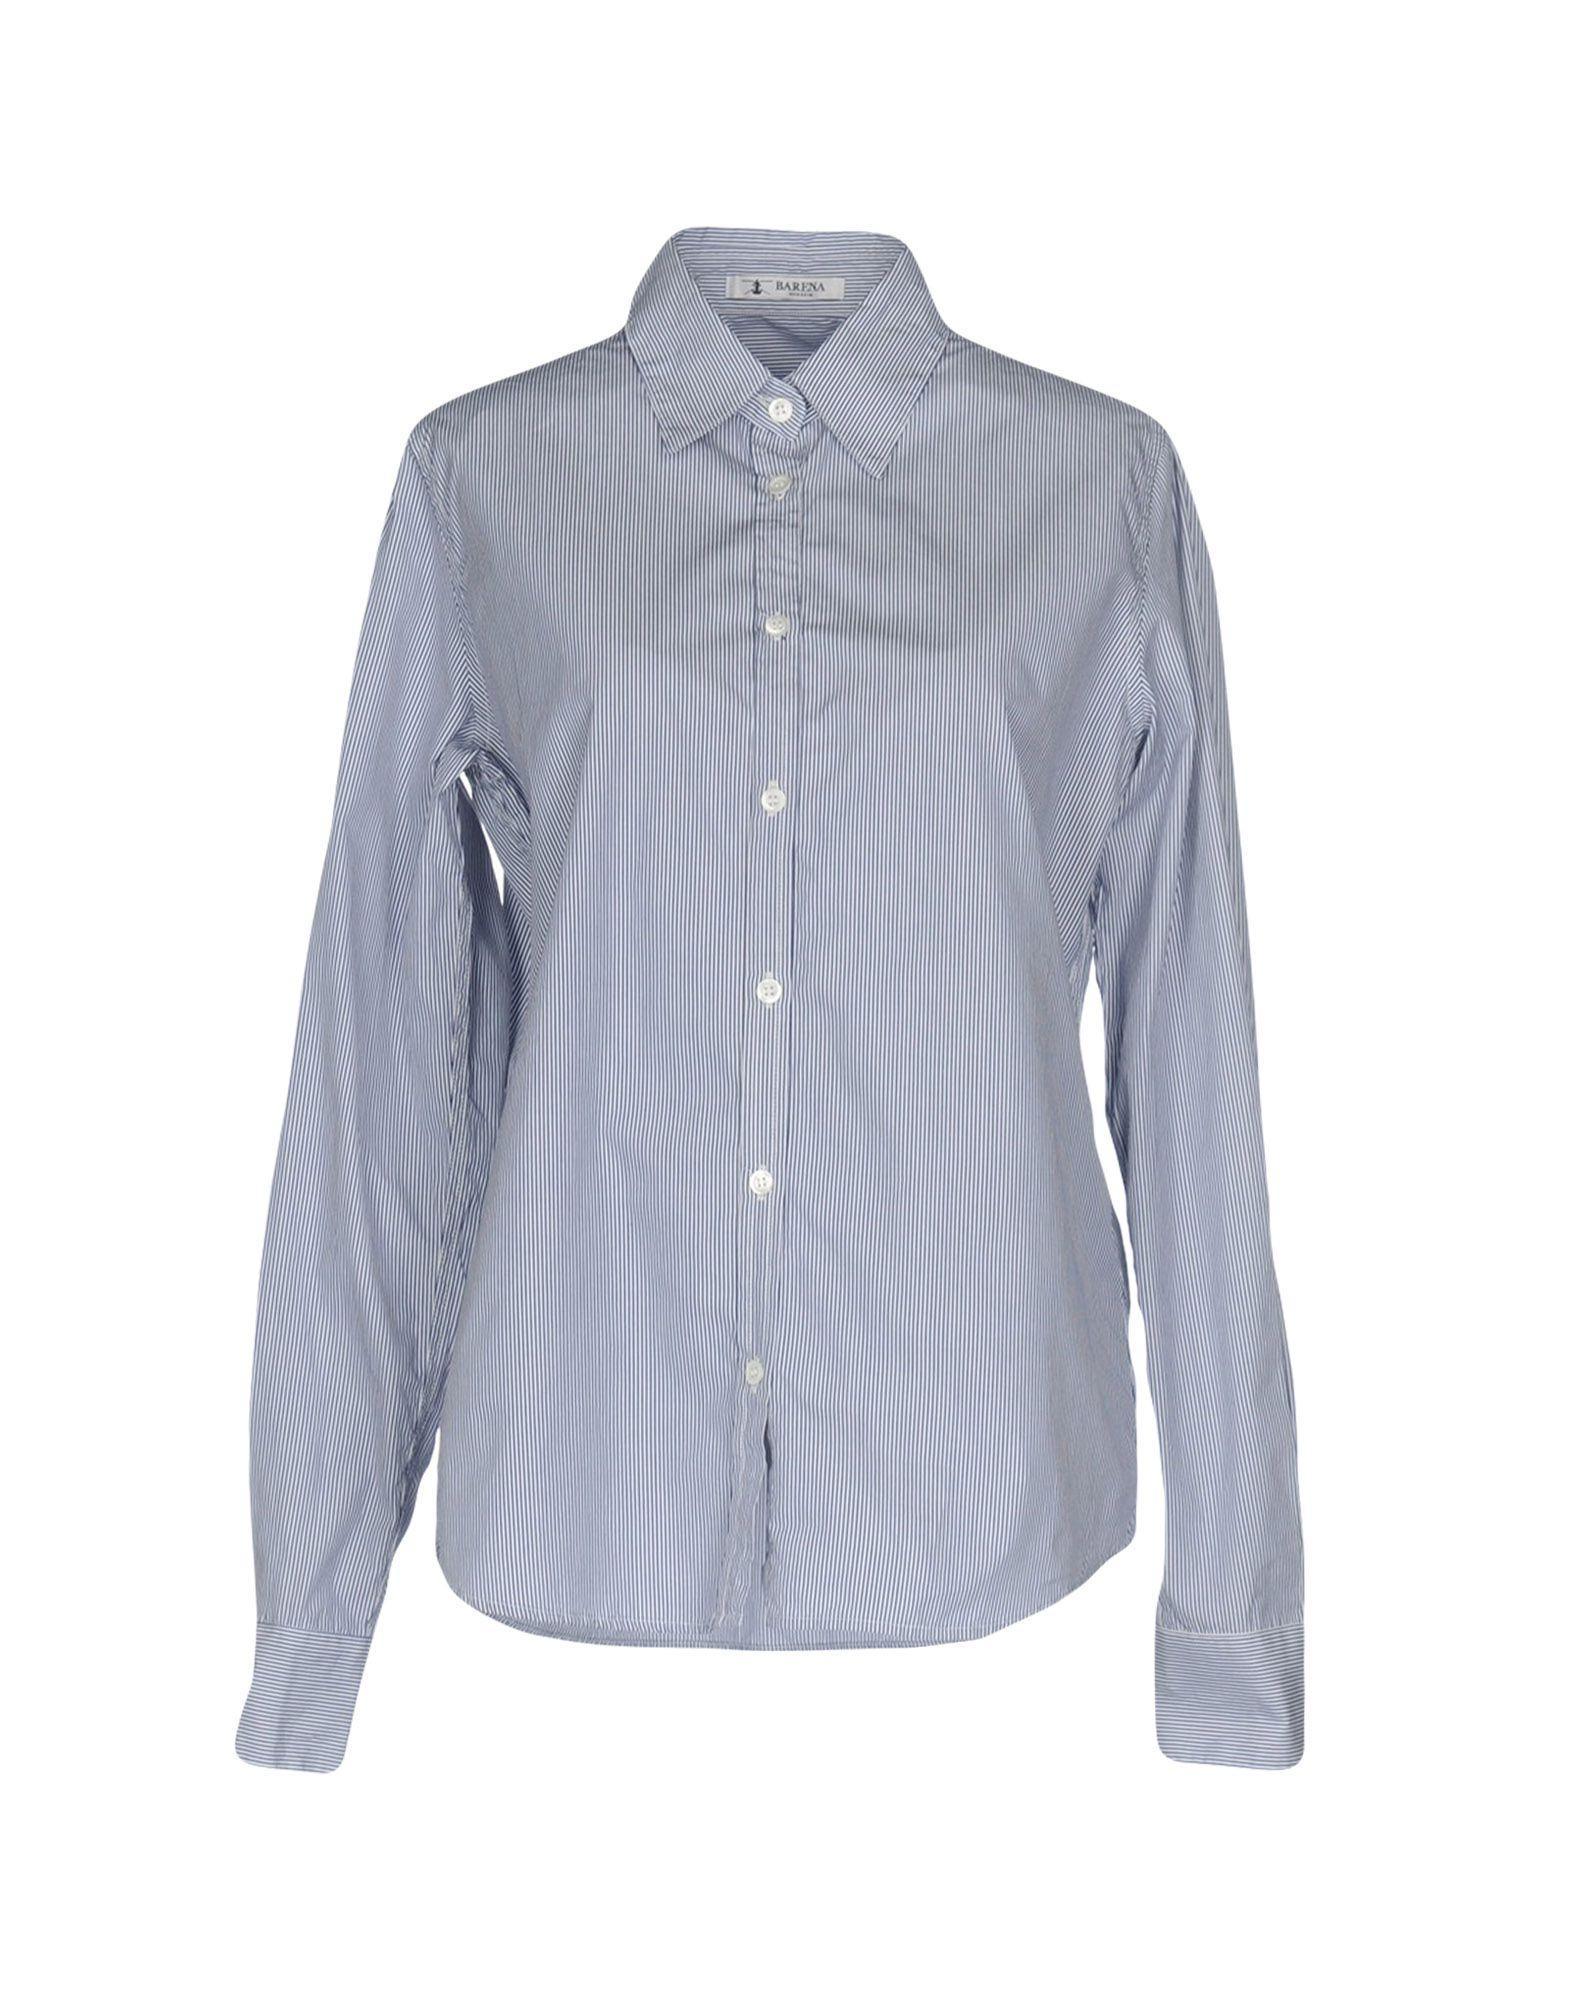 Barena Venezia Striped Shirt In Dark Blue